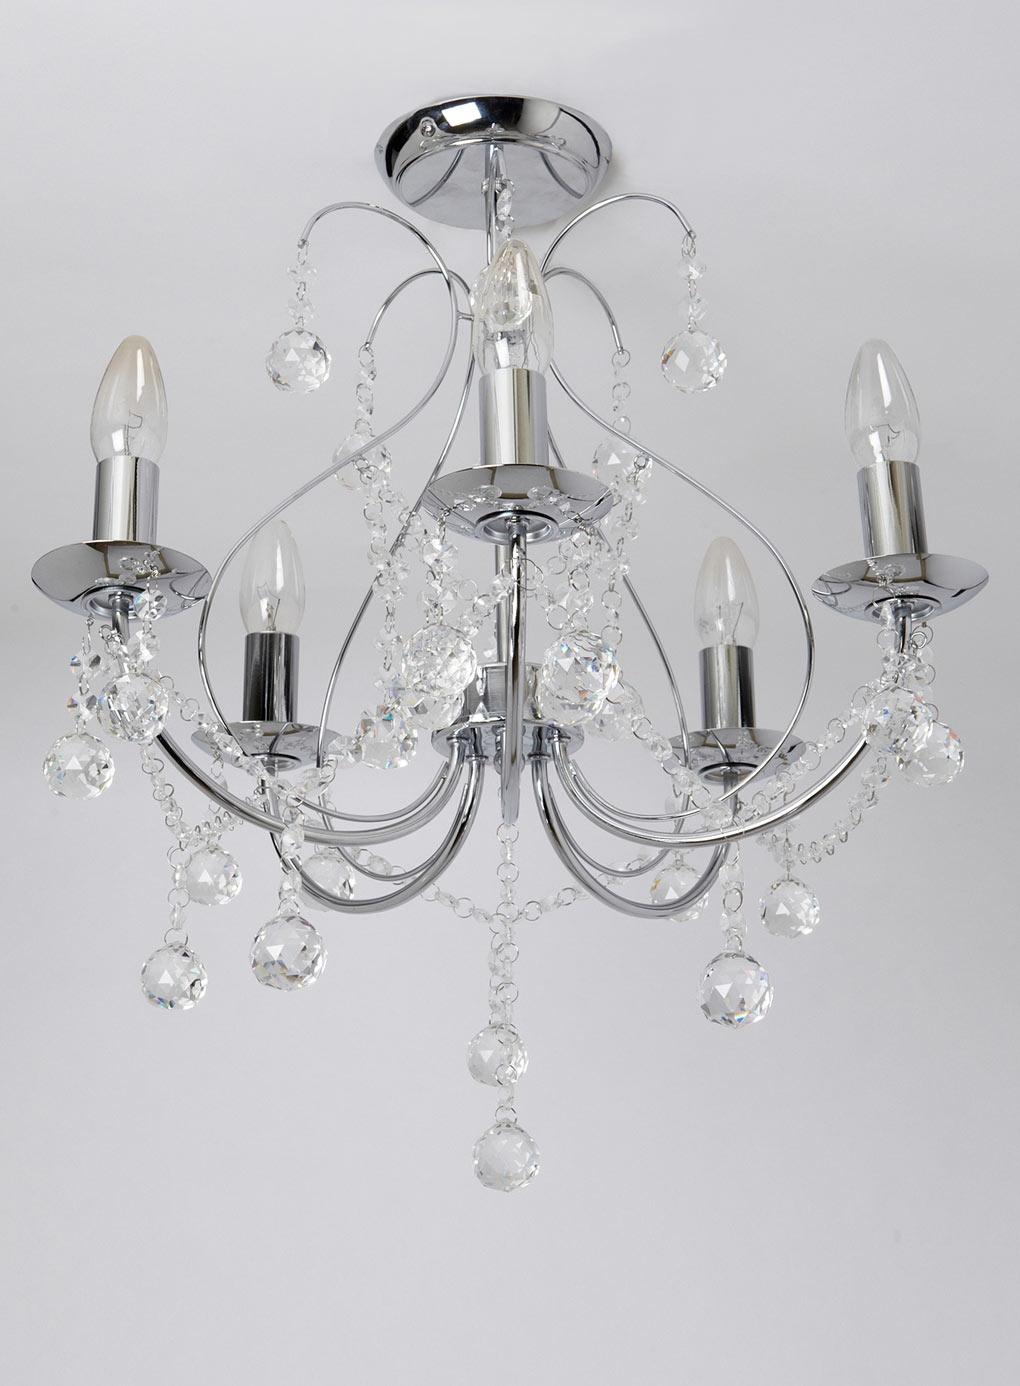 Flush Light Fittings For Living Room Grotly With Flush Fitting Chandelier (#5 of 12)